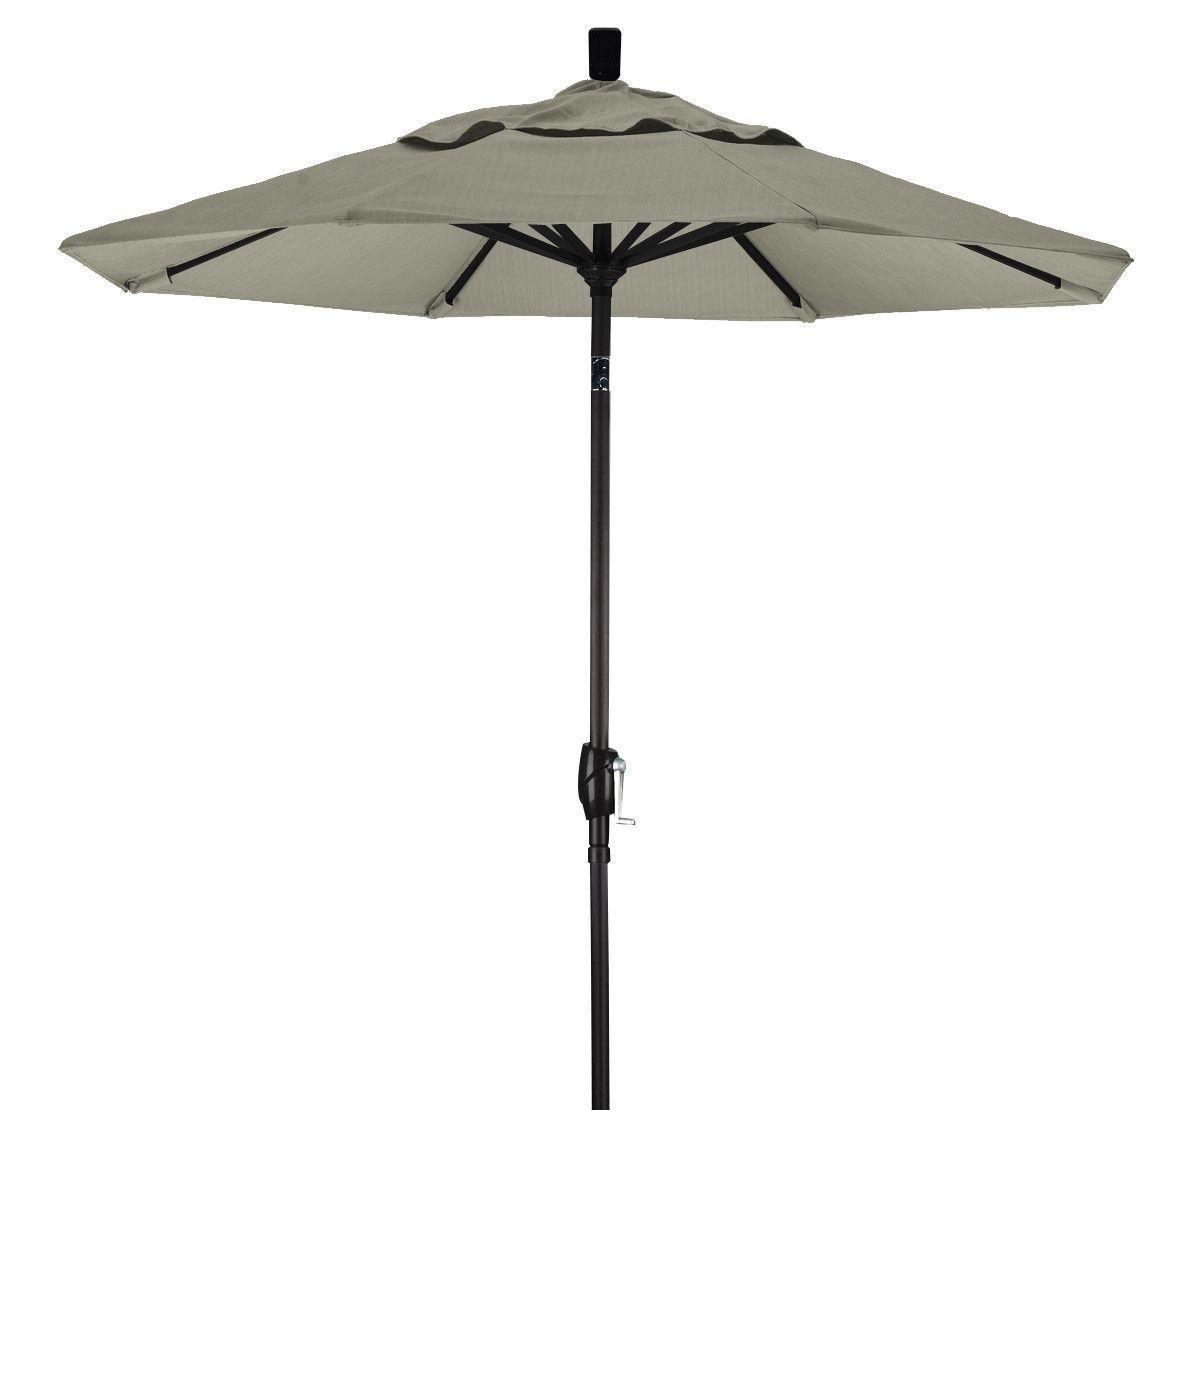 Eclipse Collection 7.5' Aluminum Market Umbrella Push Tilt M Black/Pacifica/Taupe